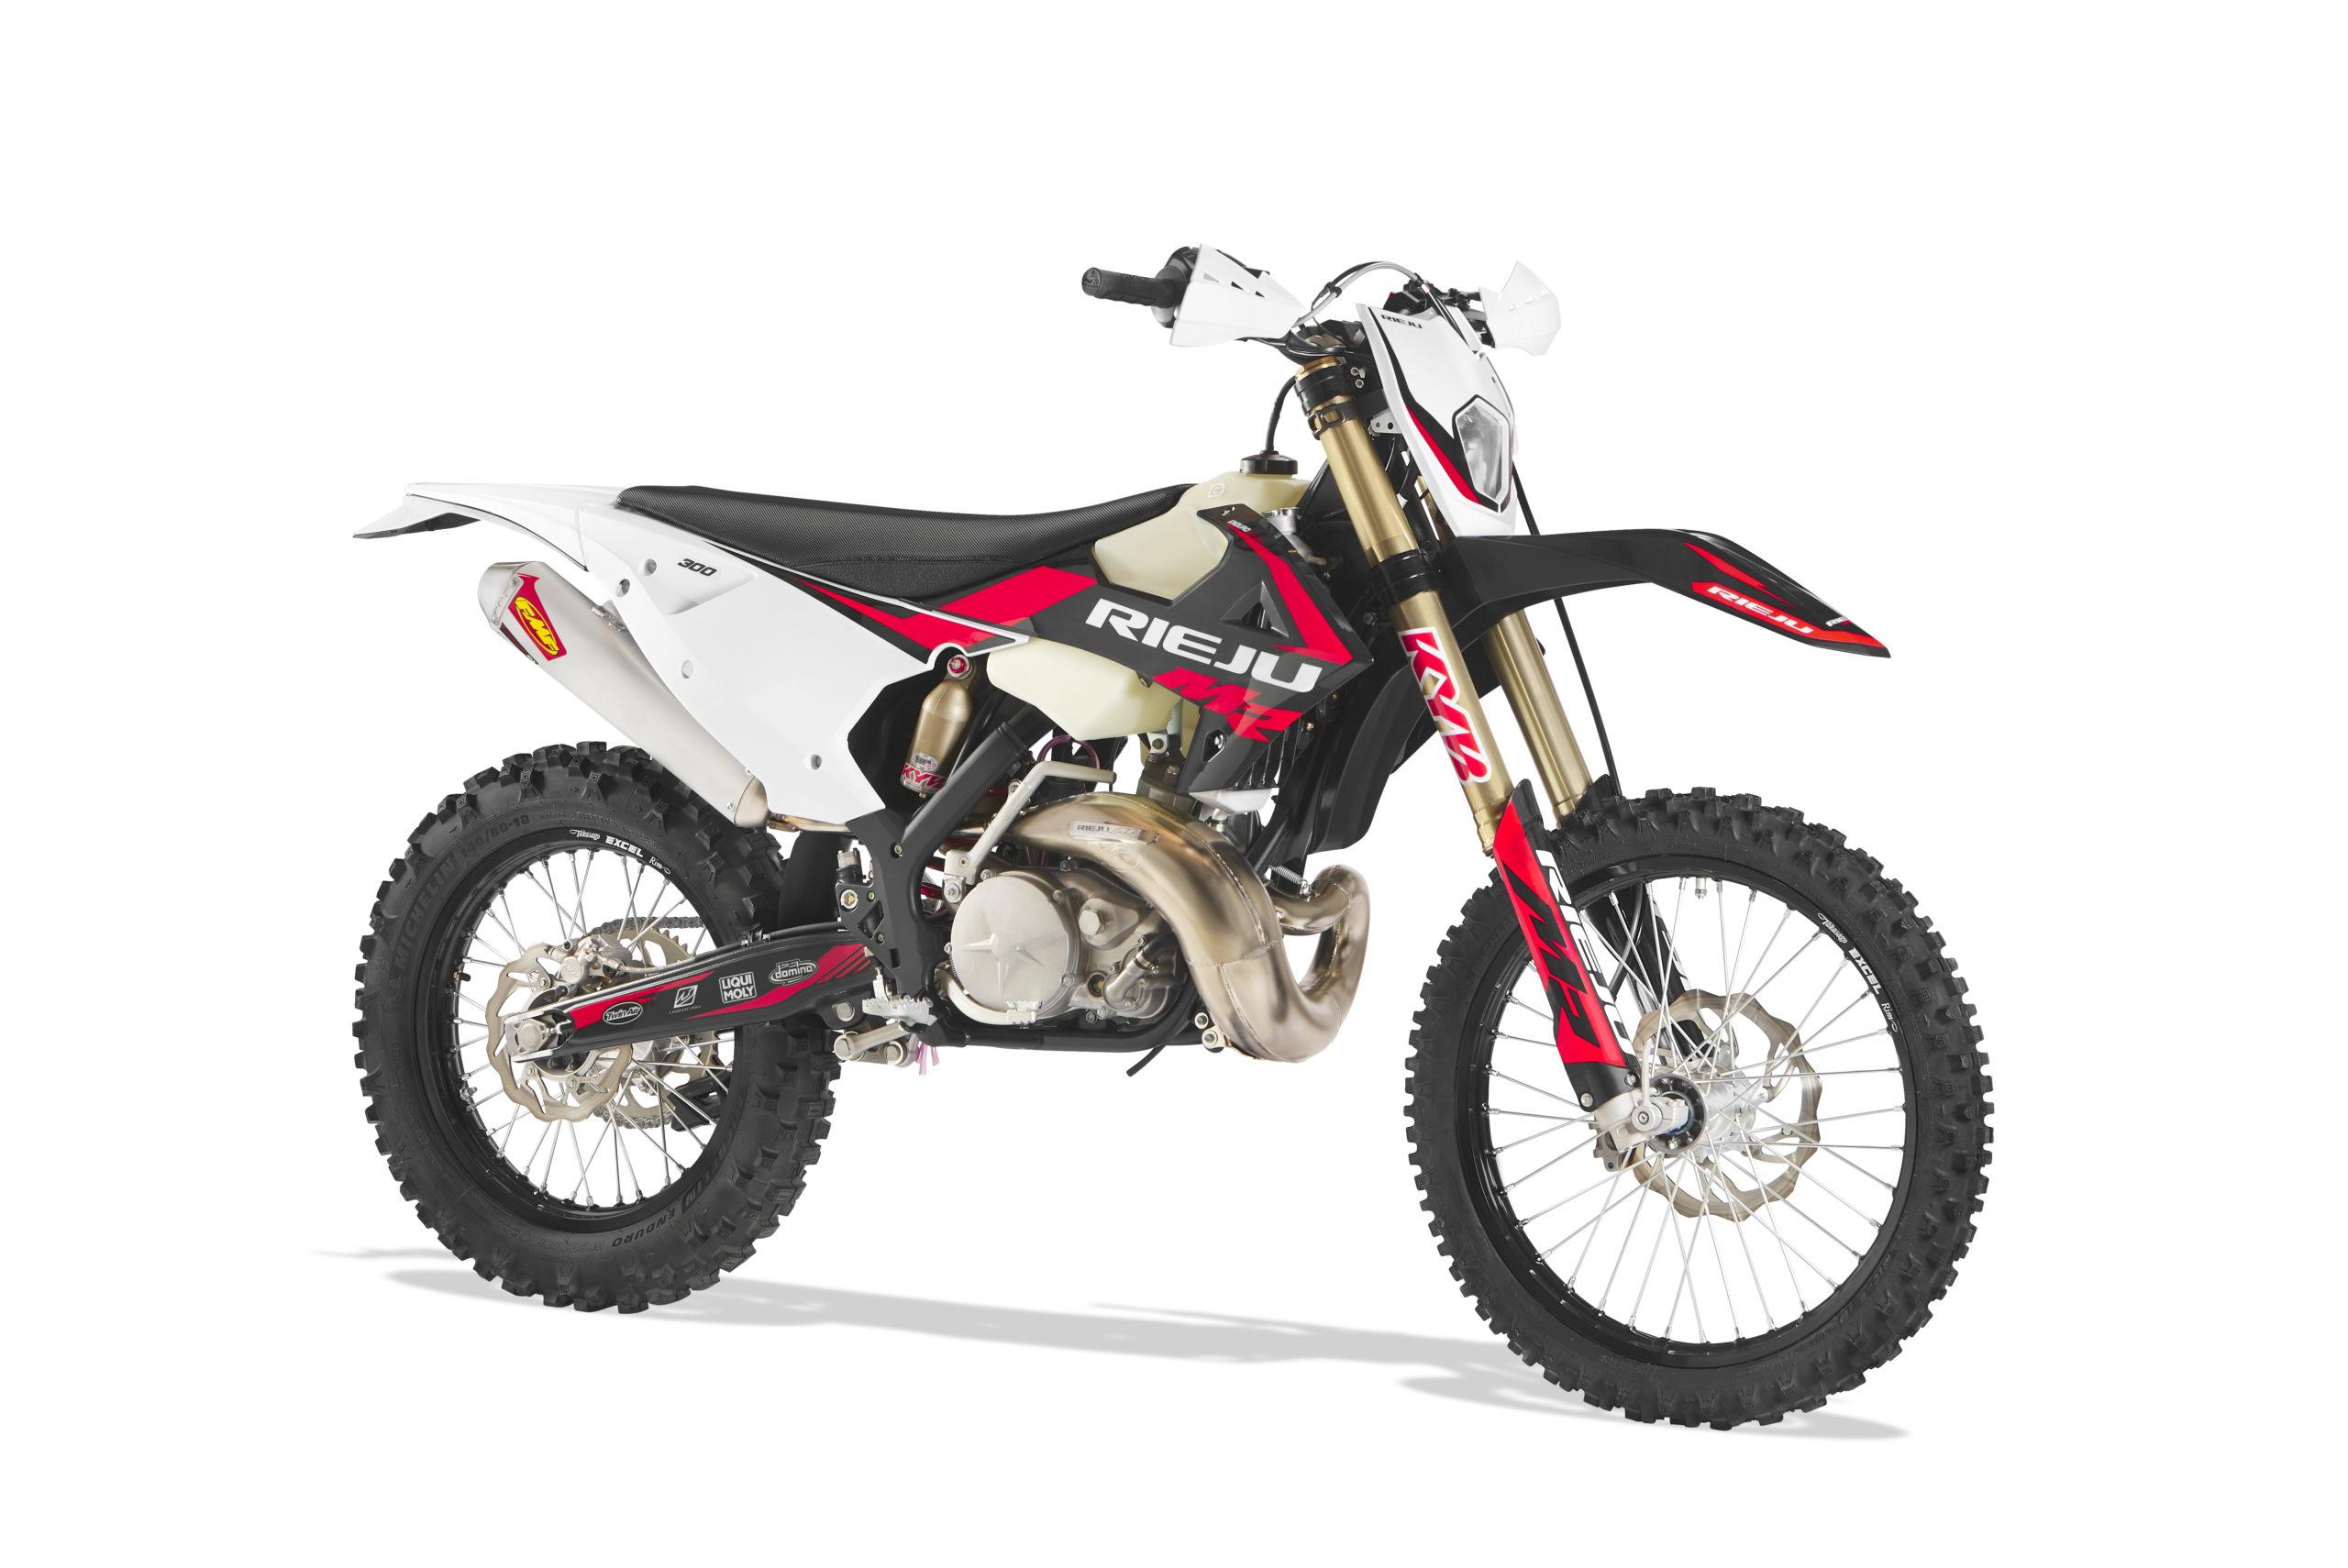 MR 300 Racing 2T